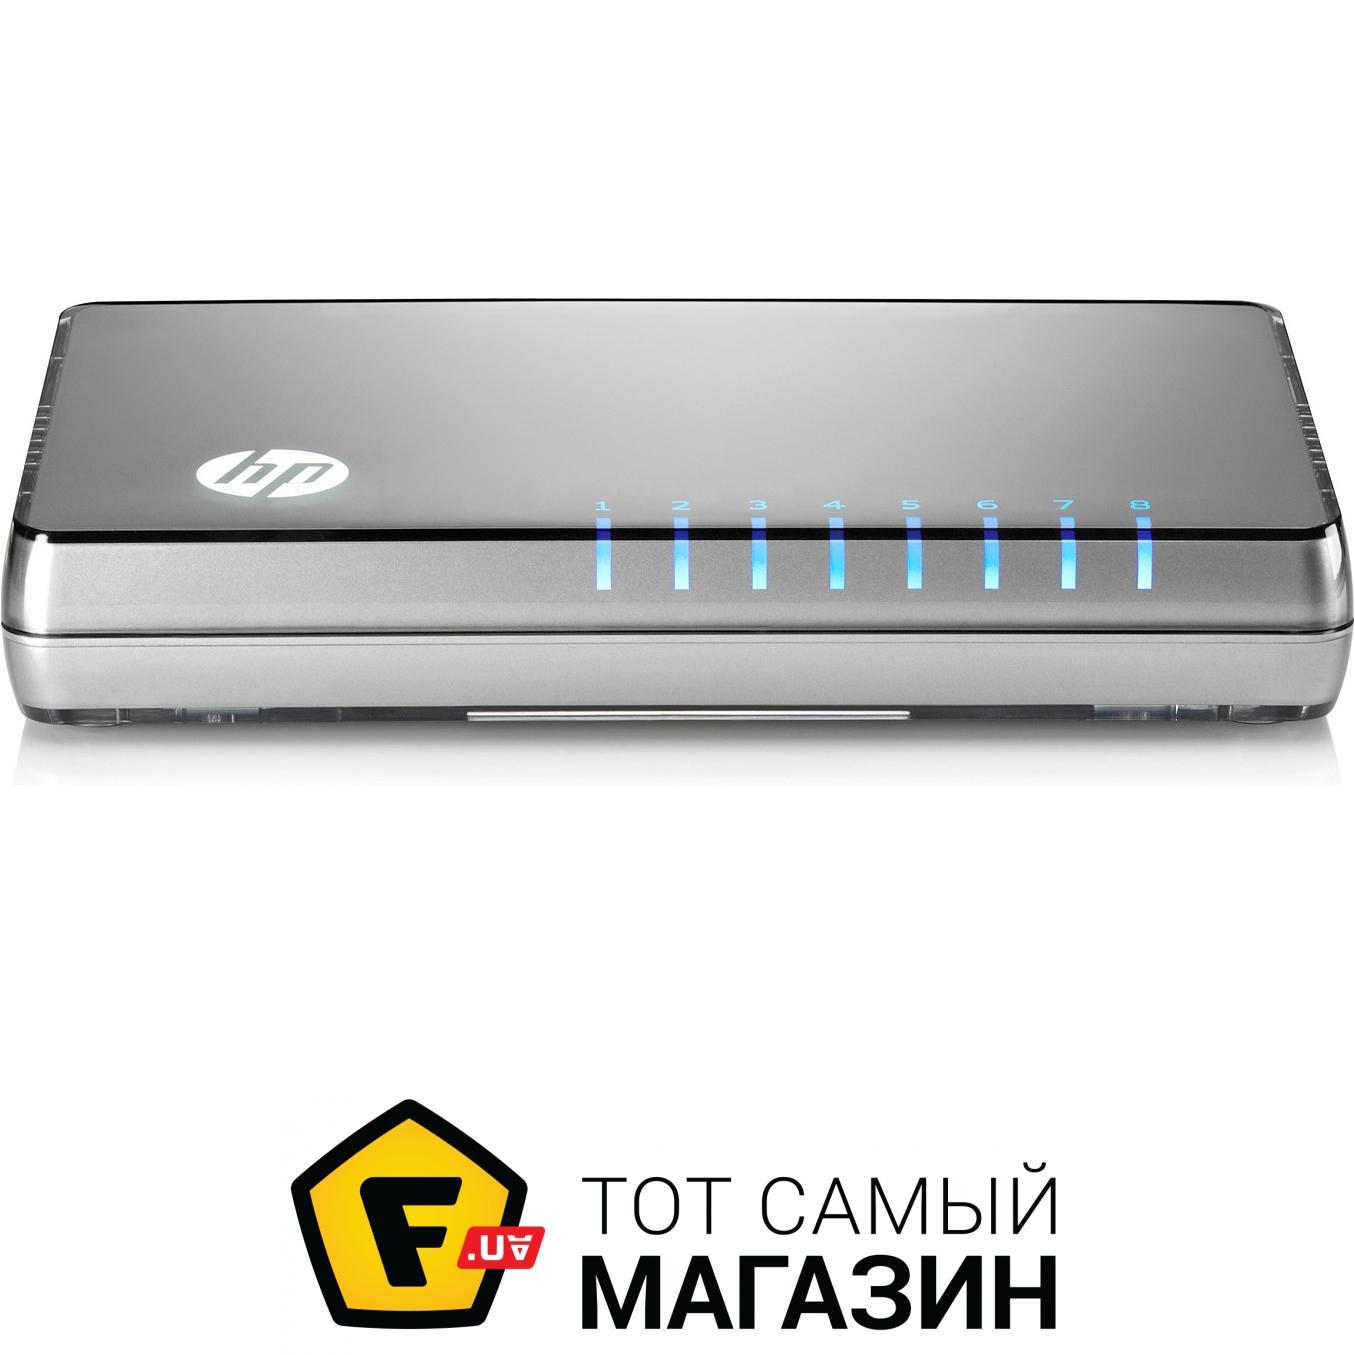 Коммутатор HP 1910-48 Switch (JG540A) 48x100 2x1 Гб/c или 2xSFP